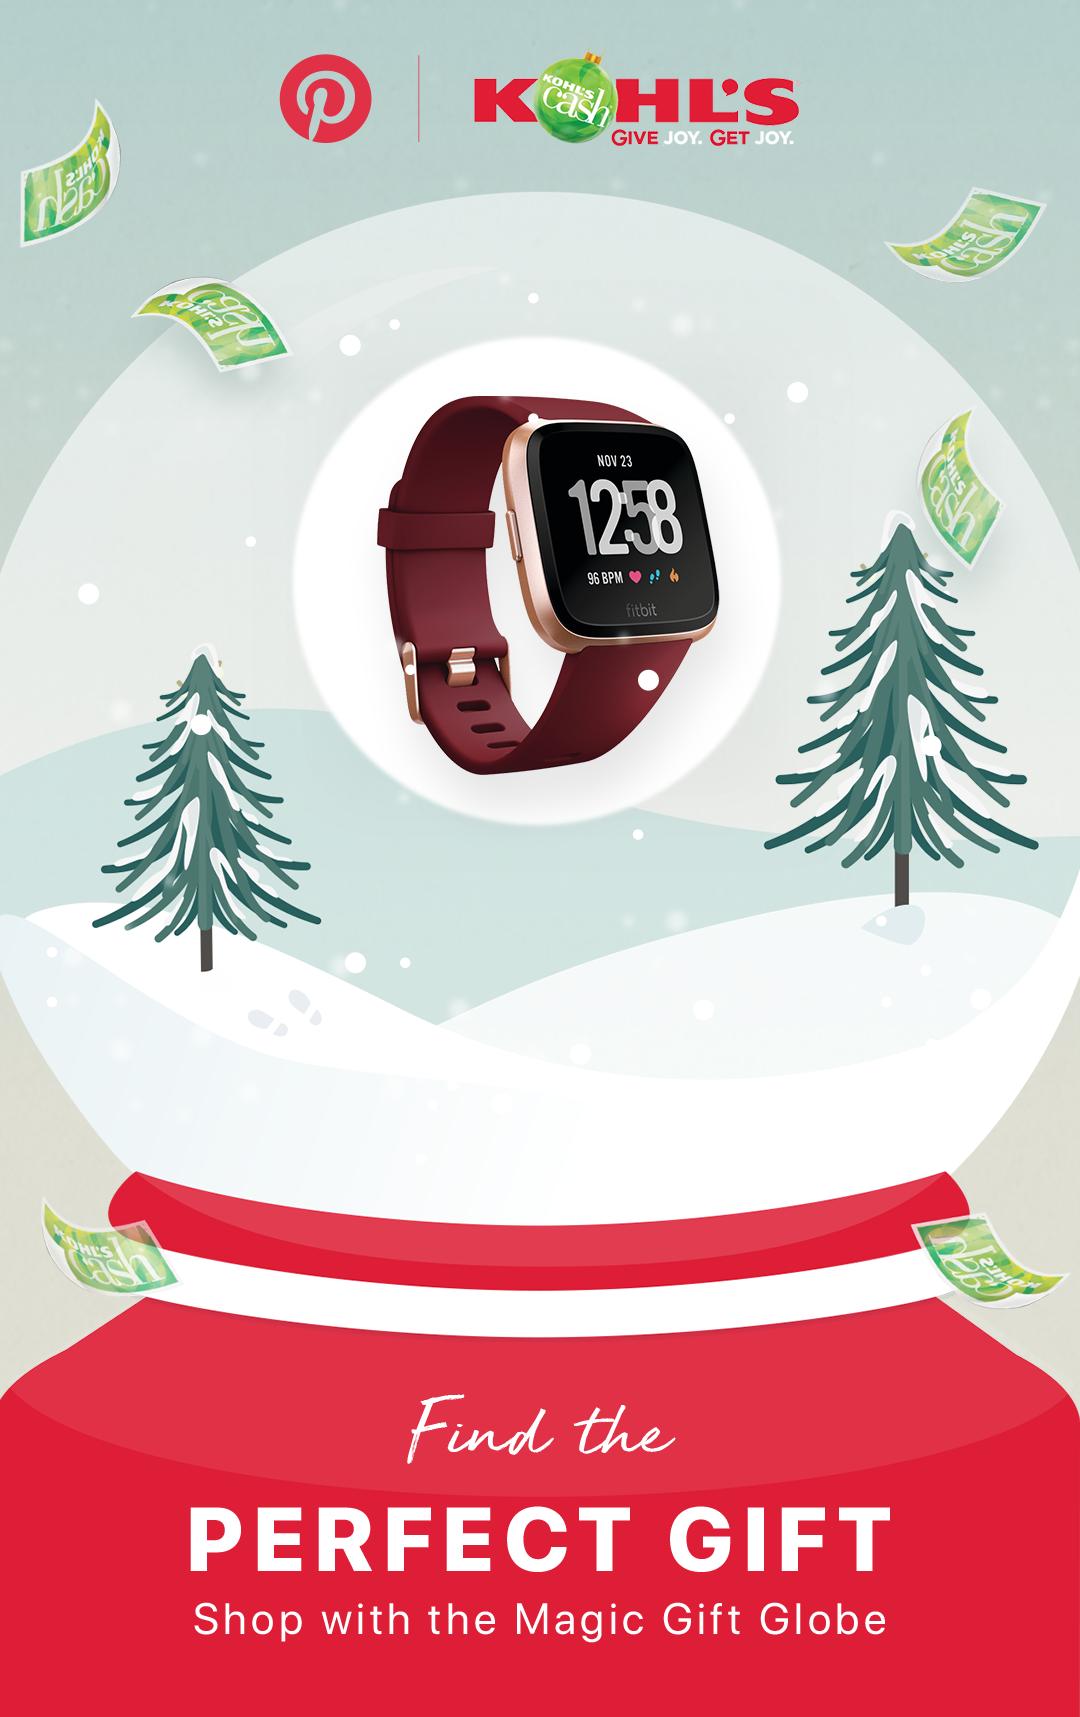 Pin by Kohl\'s on Kohl\'s + Pinterest Gift Globe | Gifts, Christmas ...